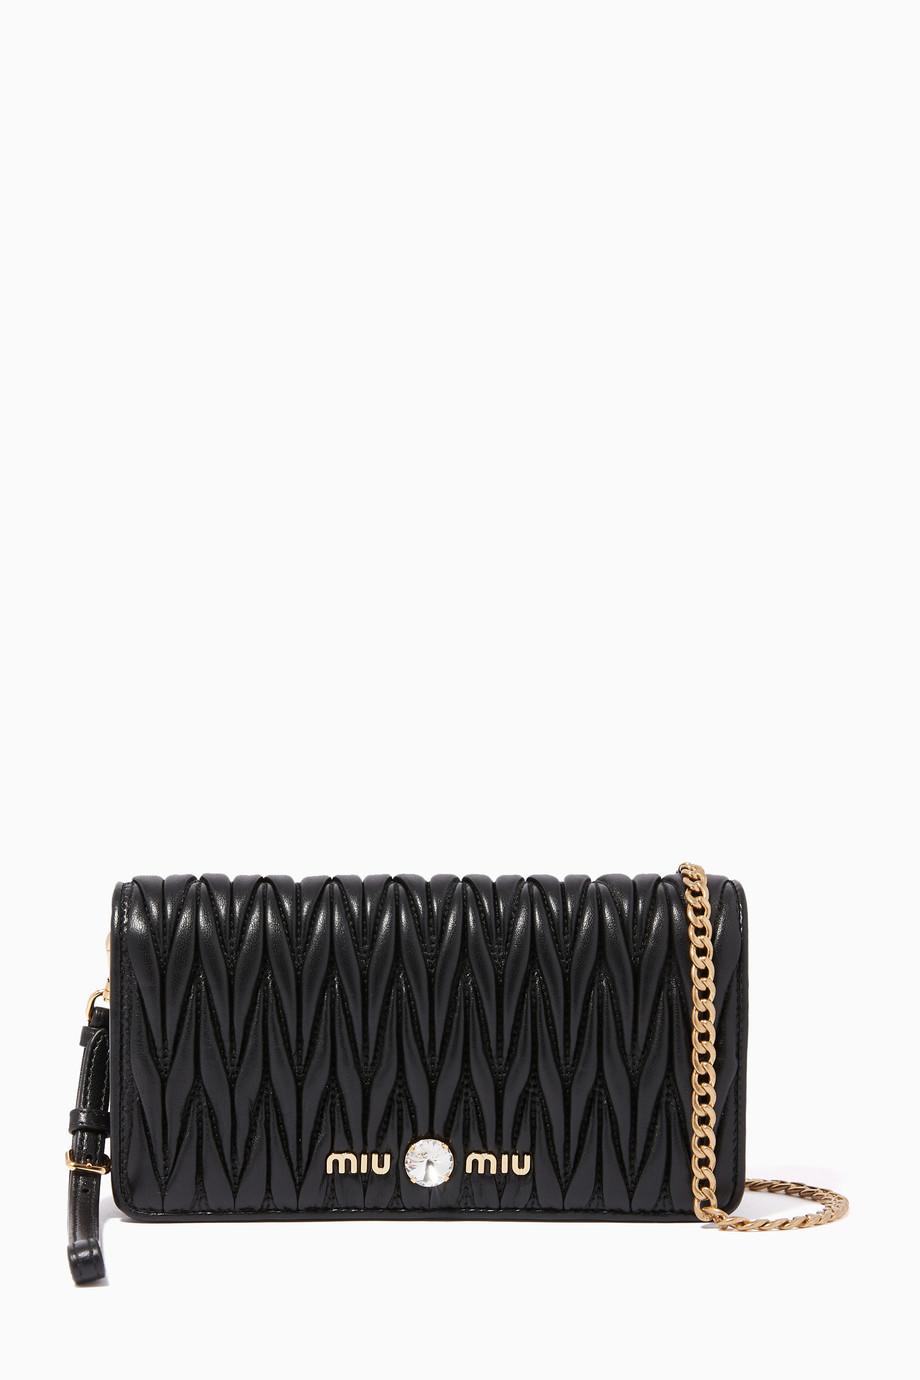 8524b1d335 Shop Miu Miu Black Matelassé Leather Chain Wallet for Women ...